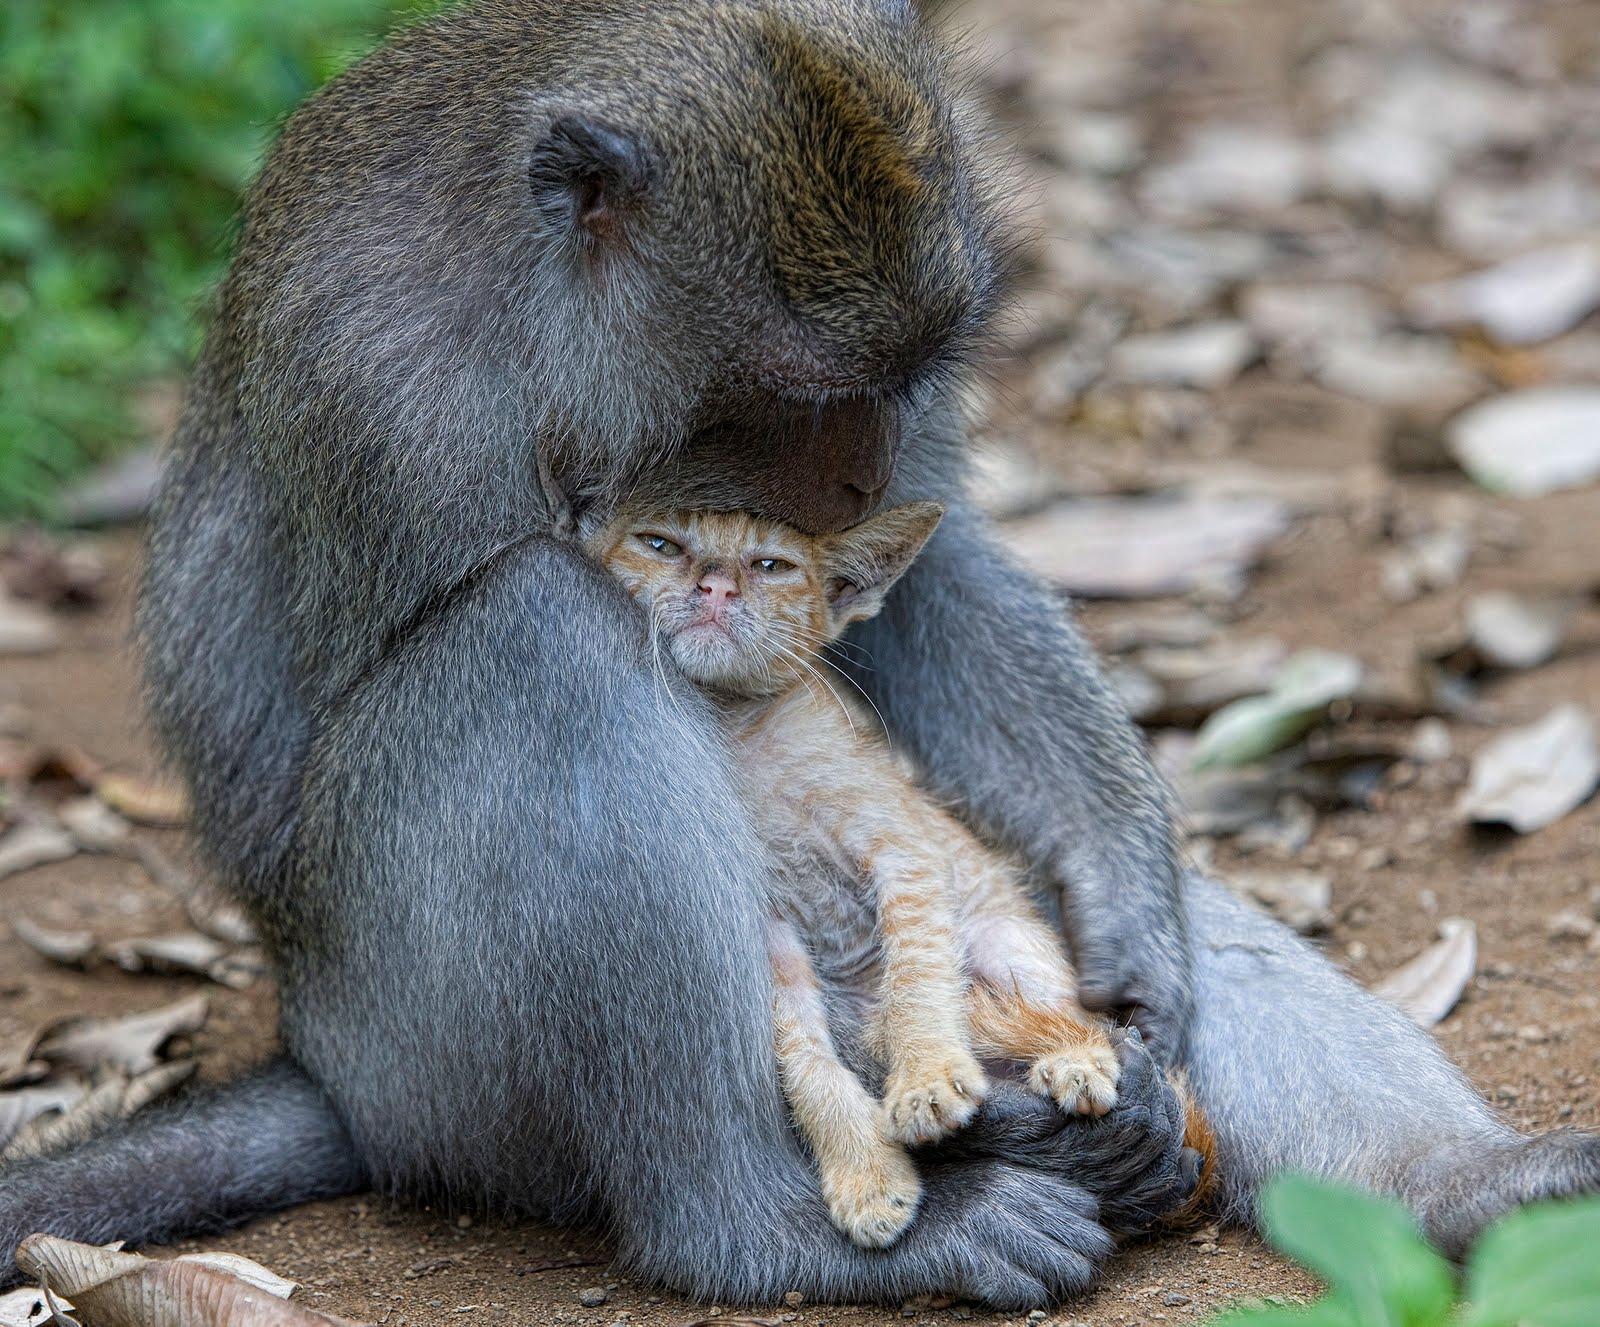 http://3.bp.blogspot.com/_8fuBbOwgwB0/THsRZxtyCcI/AAAAAAAAIzI/mjz8S7rUuMk/s1600/macaco_gato.jpg